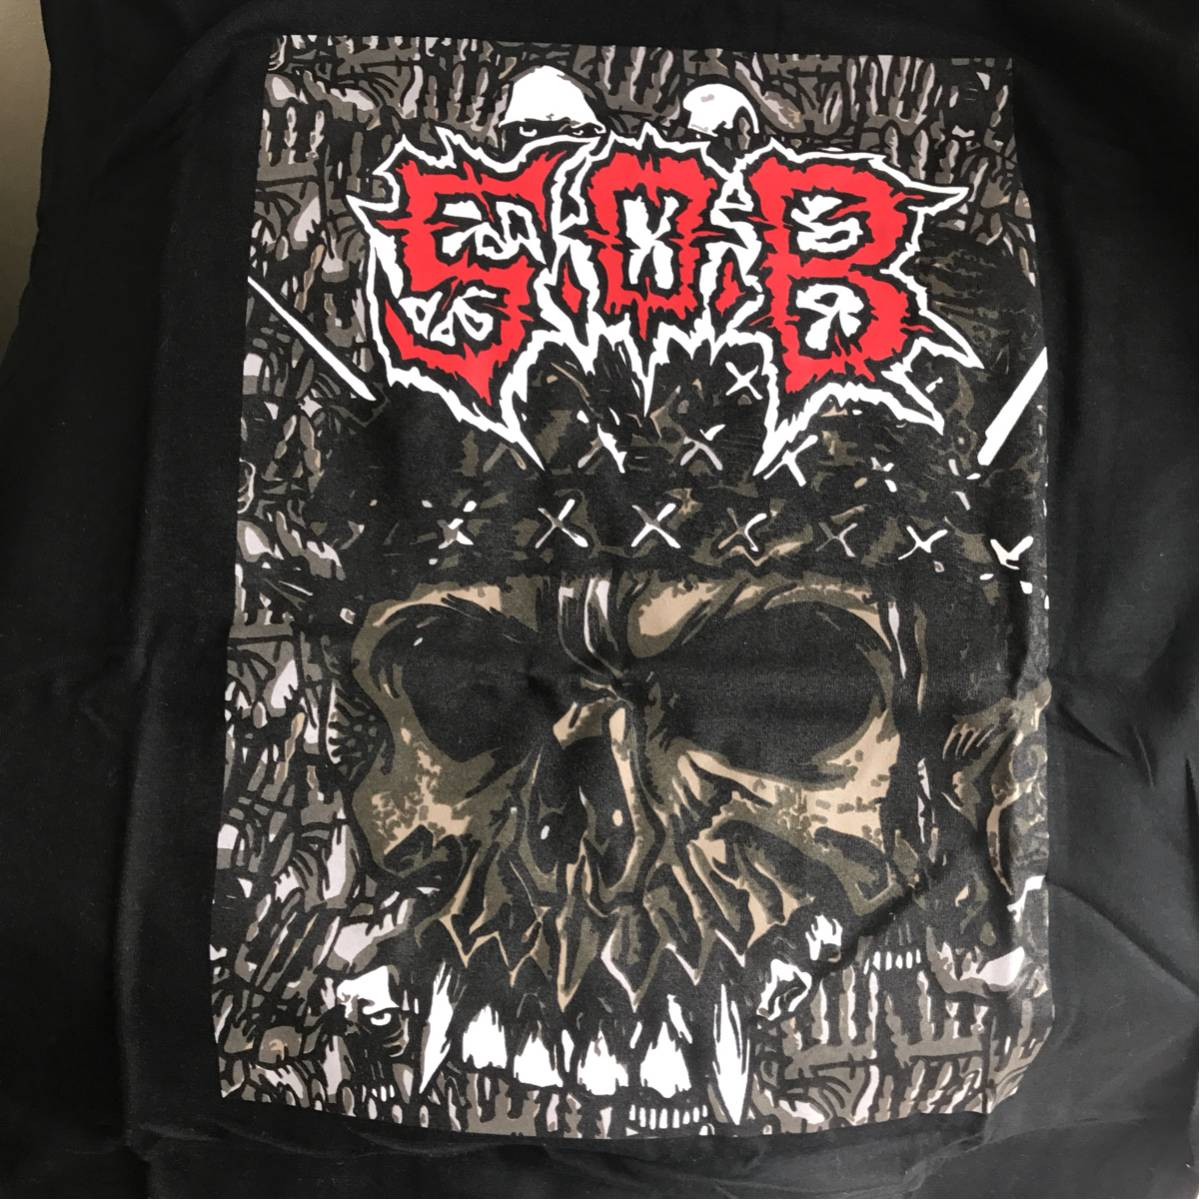 SOB S.O.B OLEDICKFOGGY Discharge. disclose gism gauze doom undercover crass. Assfort Death side Napalm Death Tシャツ brahman